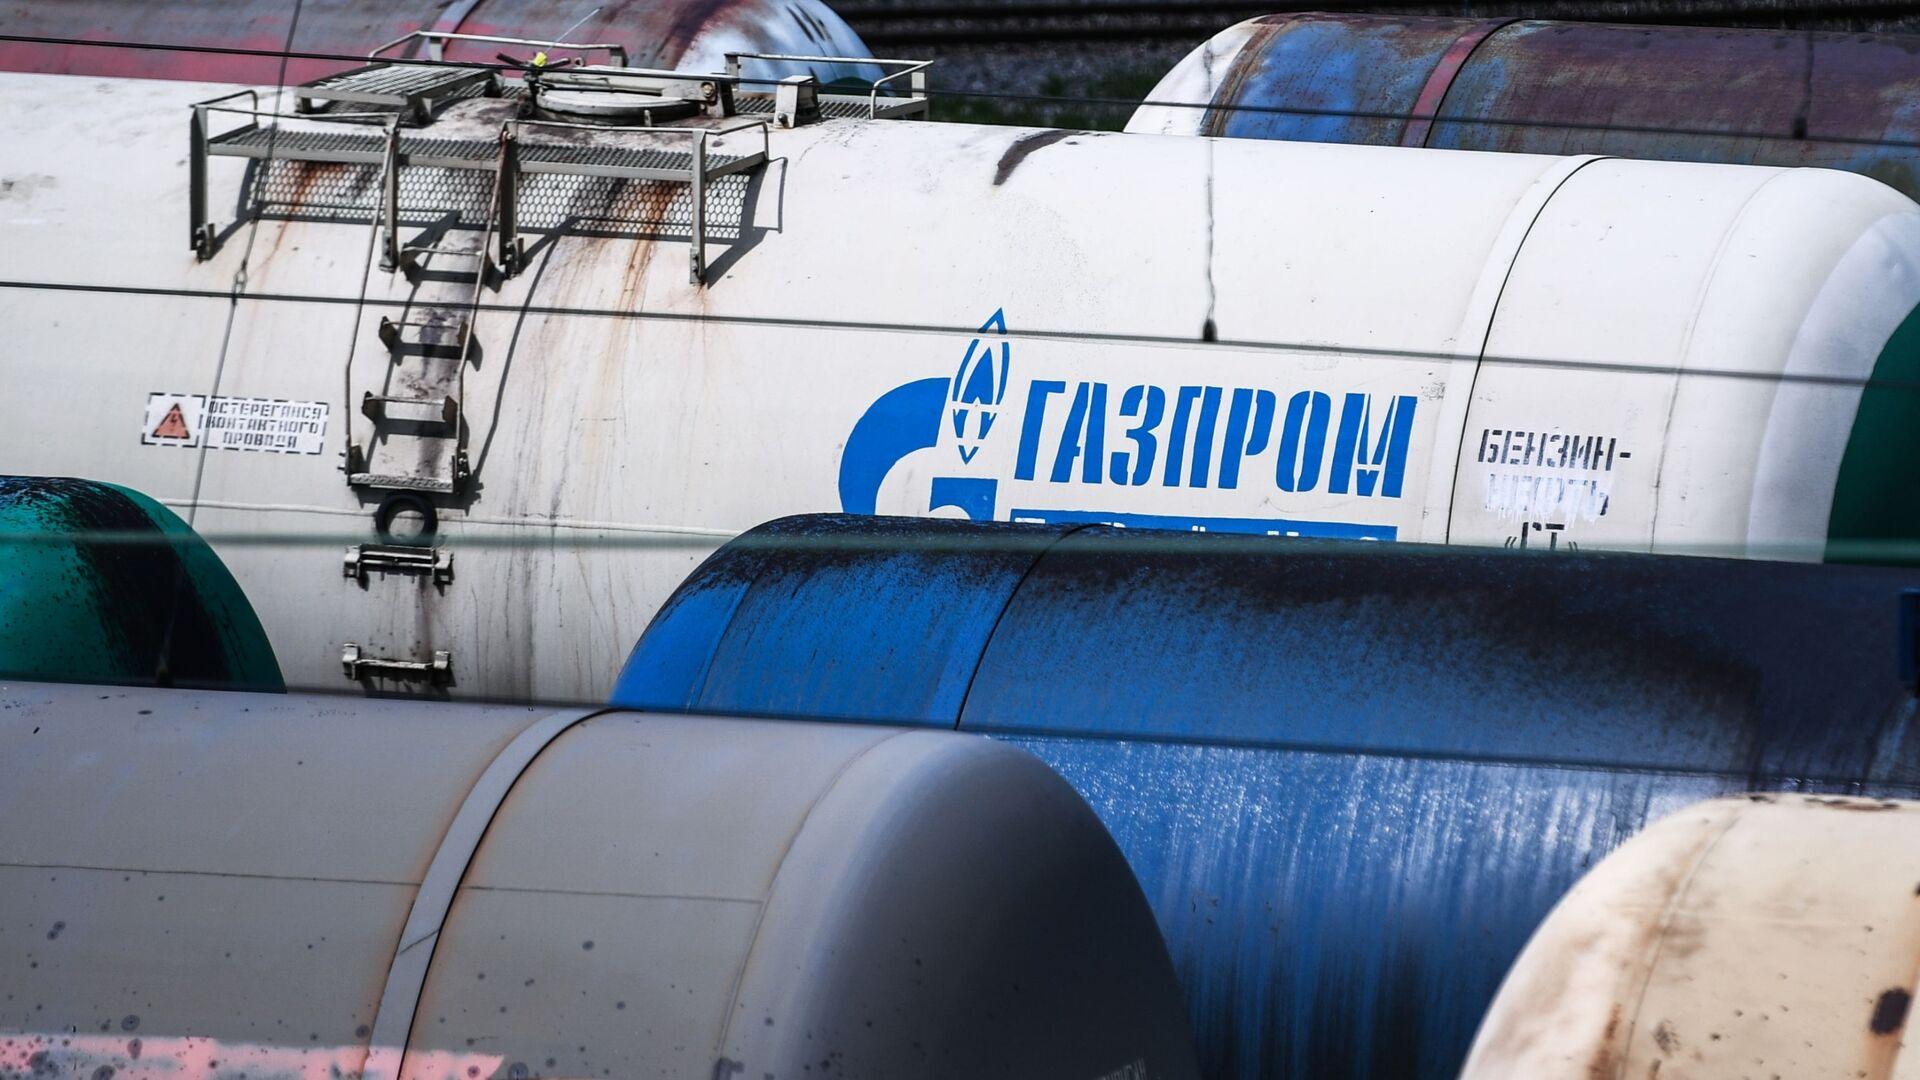 Gazprom - Sputnik Polska, 1920, 15.07.2021